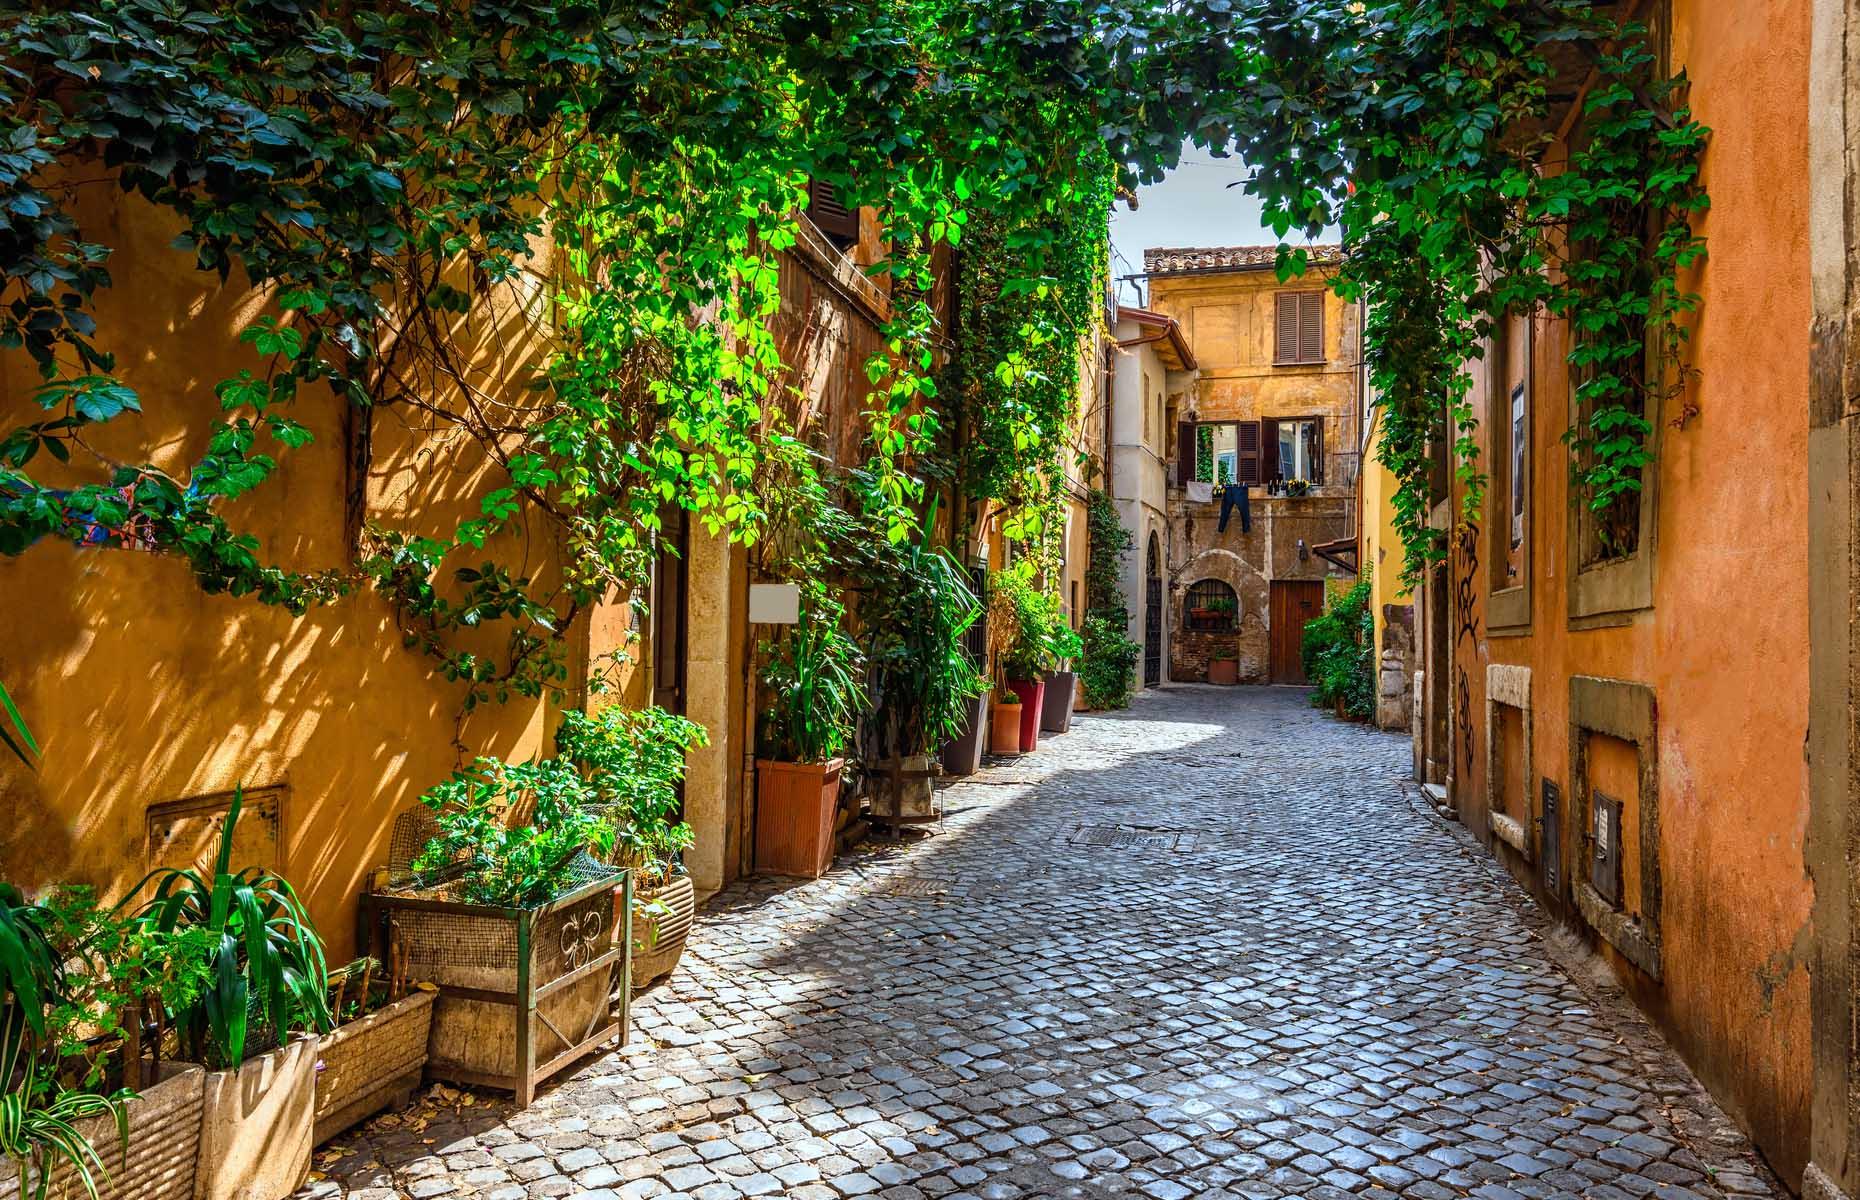 A street in Trastevere, Rome (Image: Catarina Belova/Shutterstock)